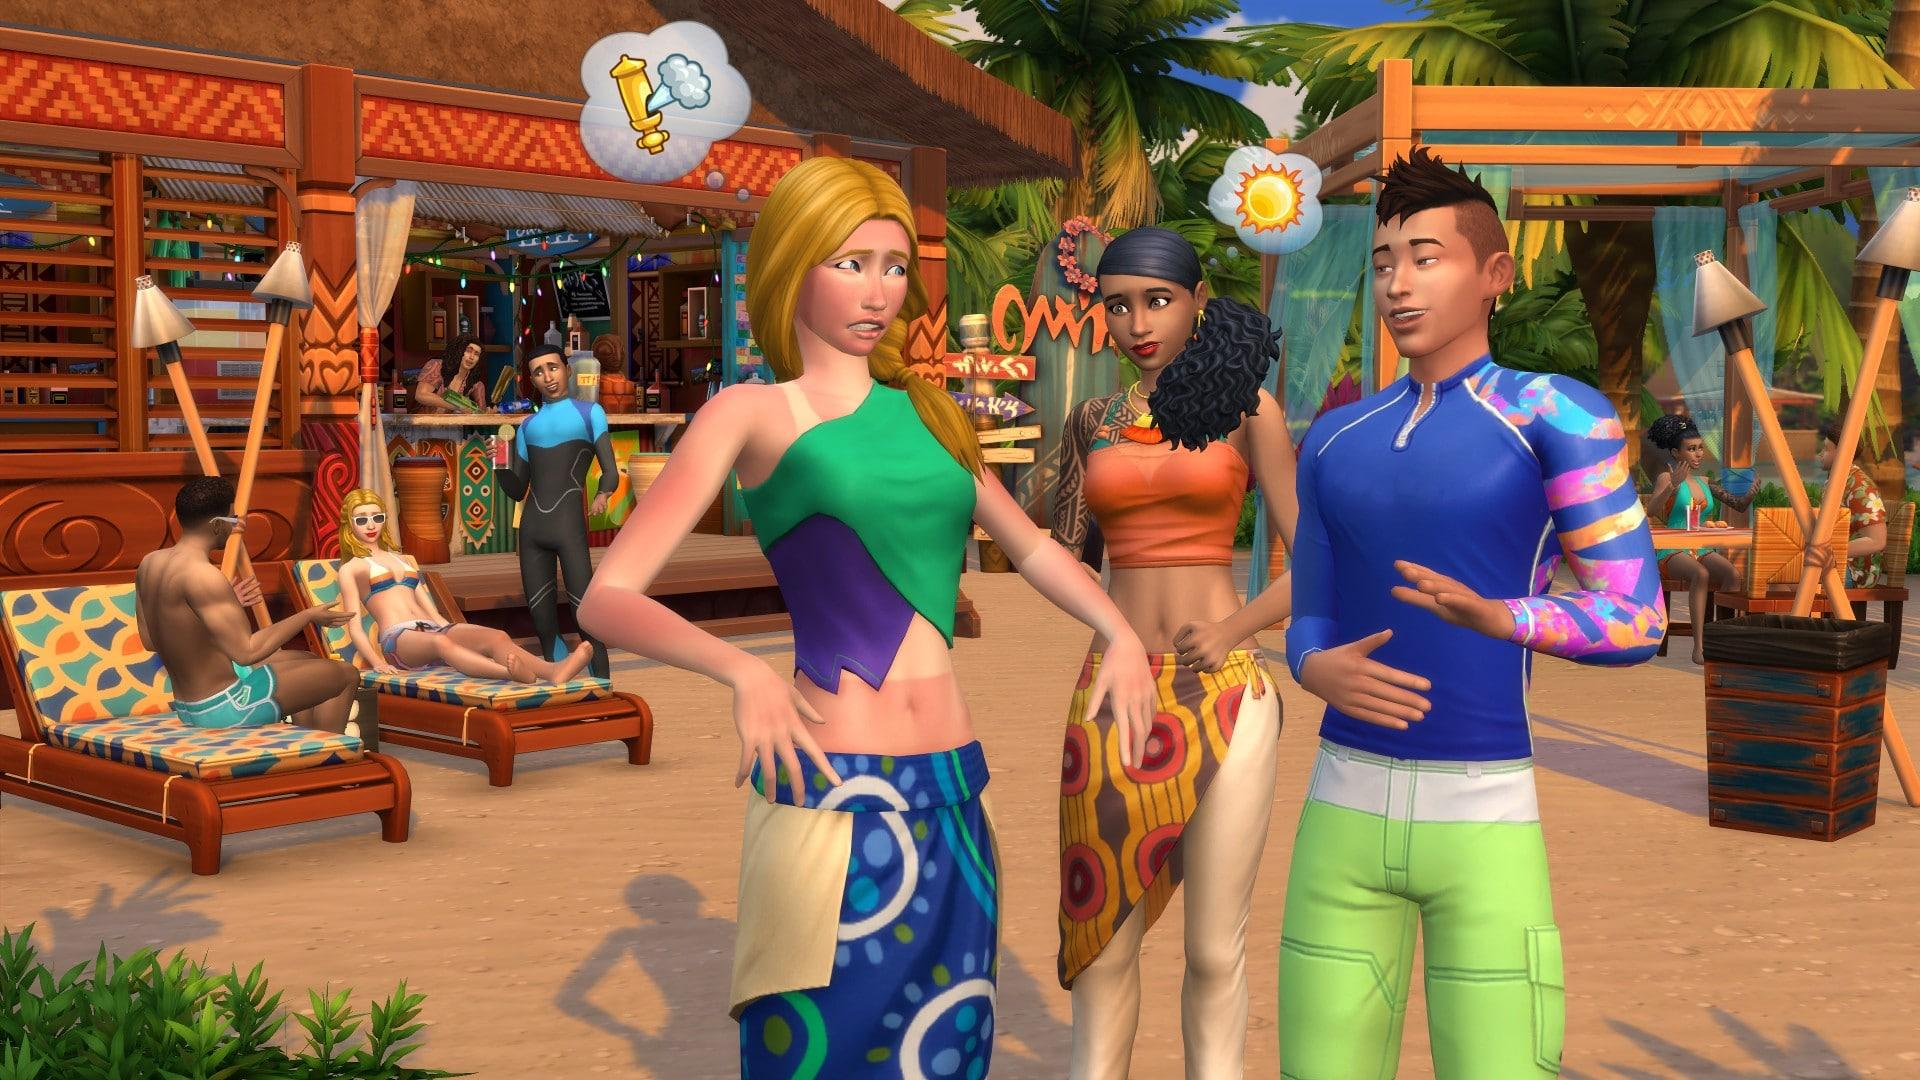 Скриншот игры Sims